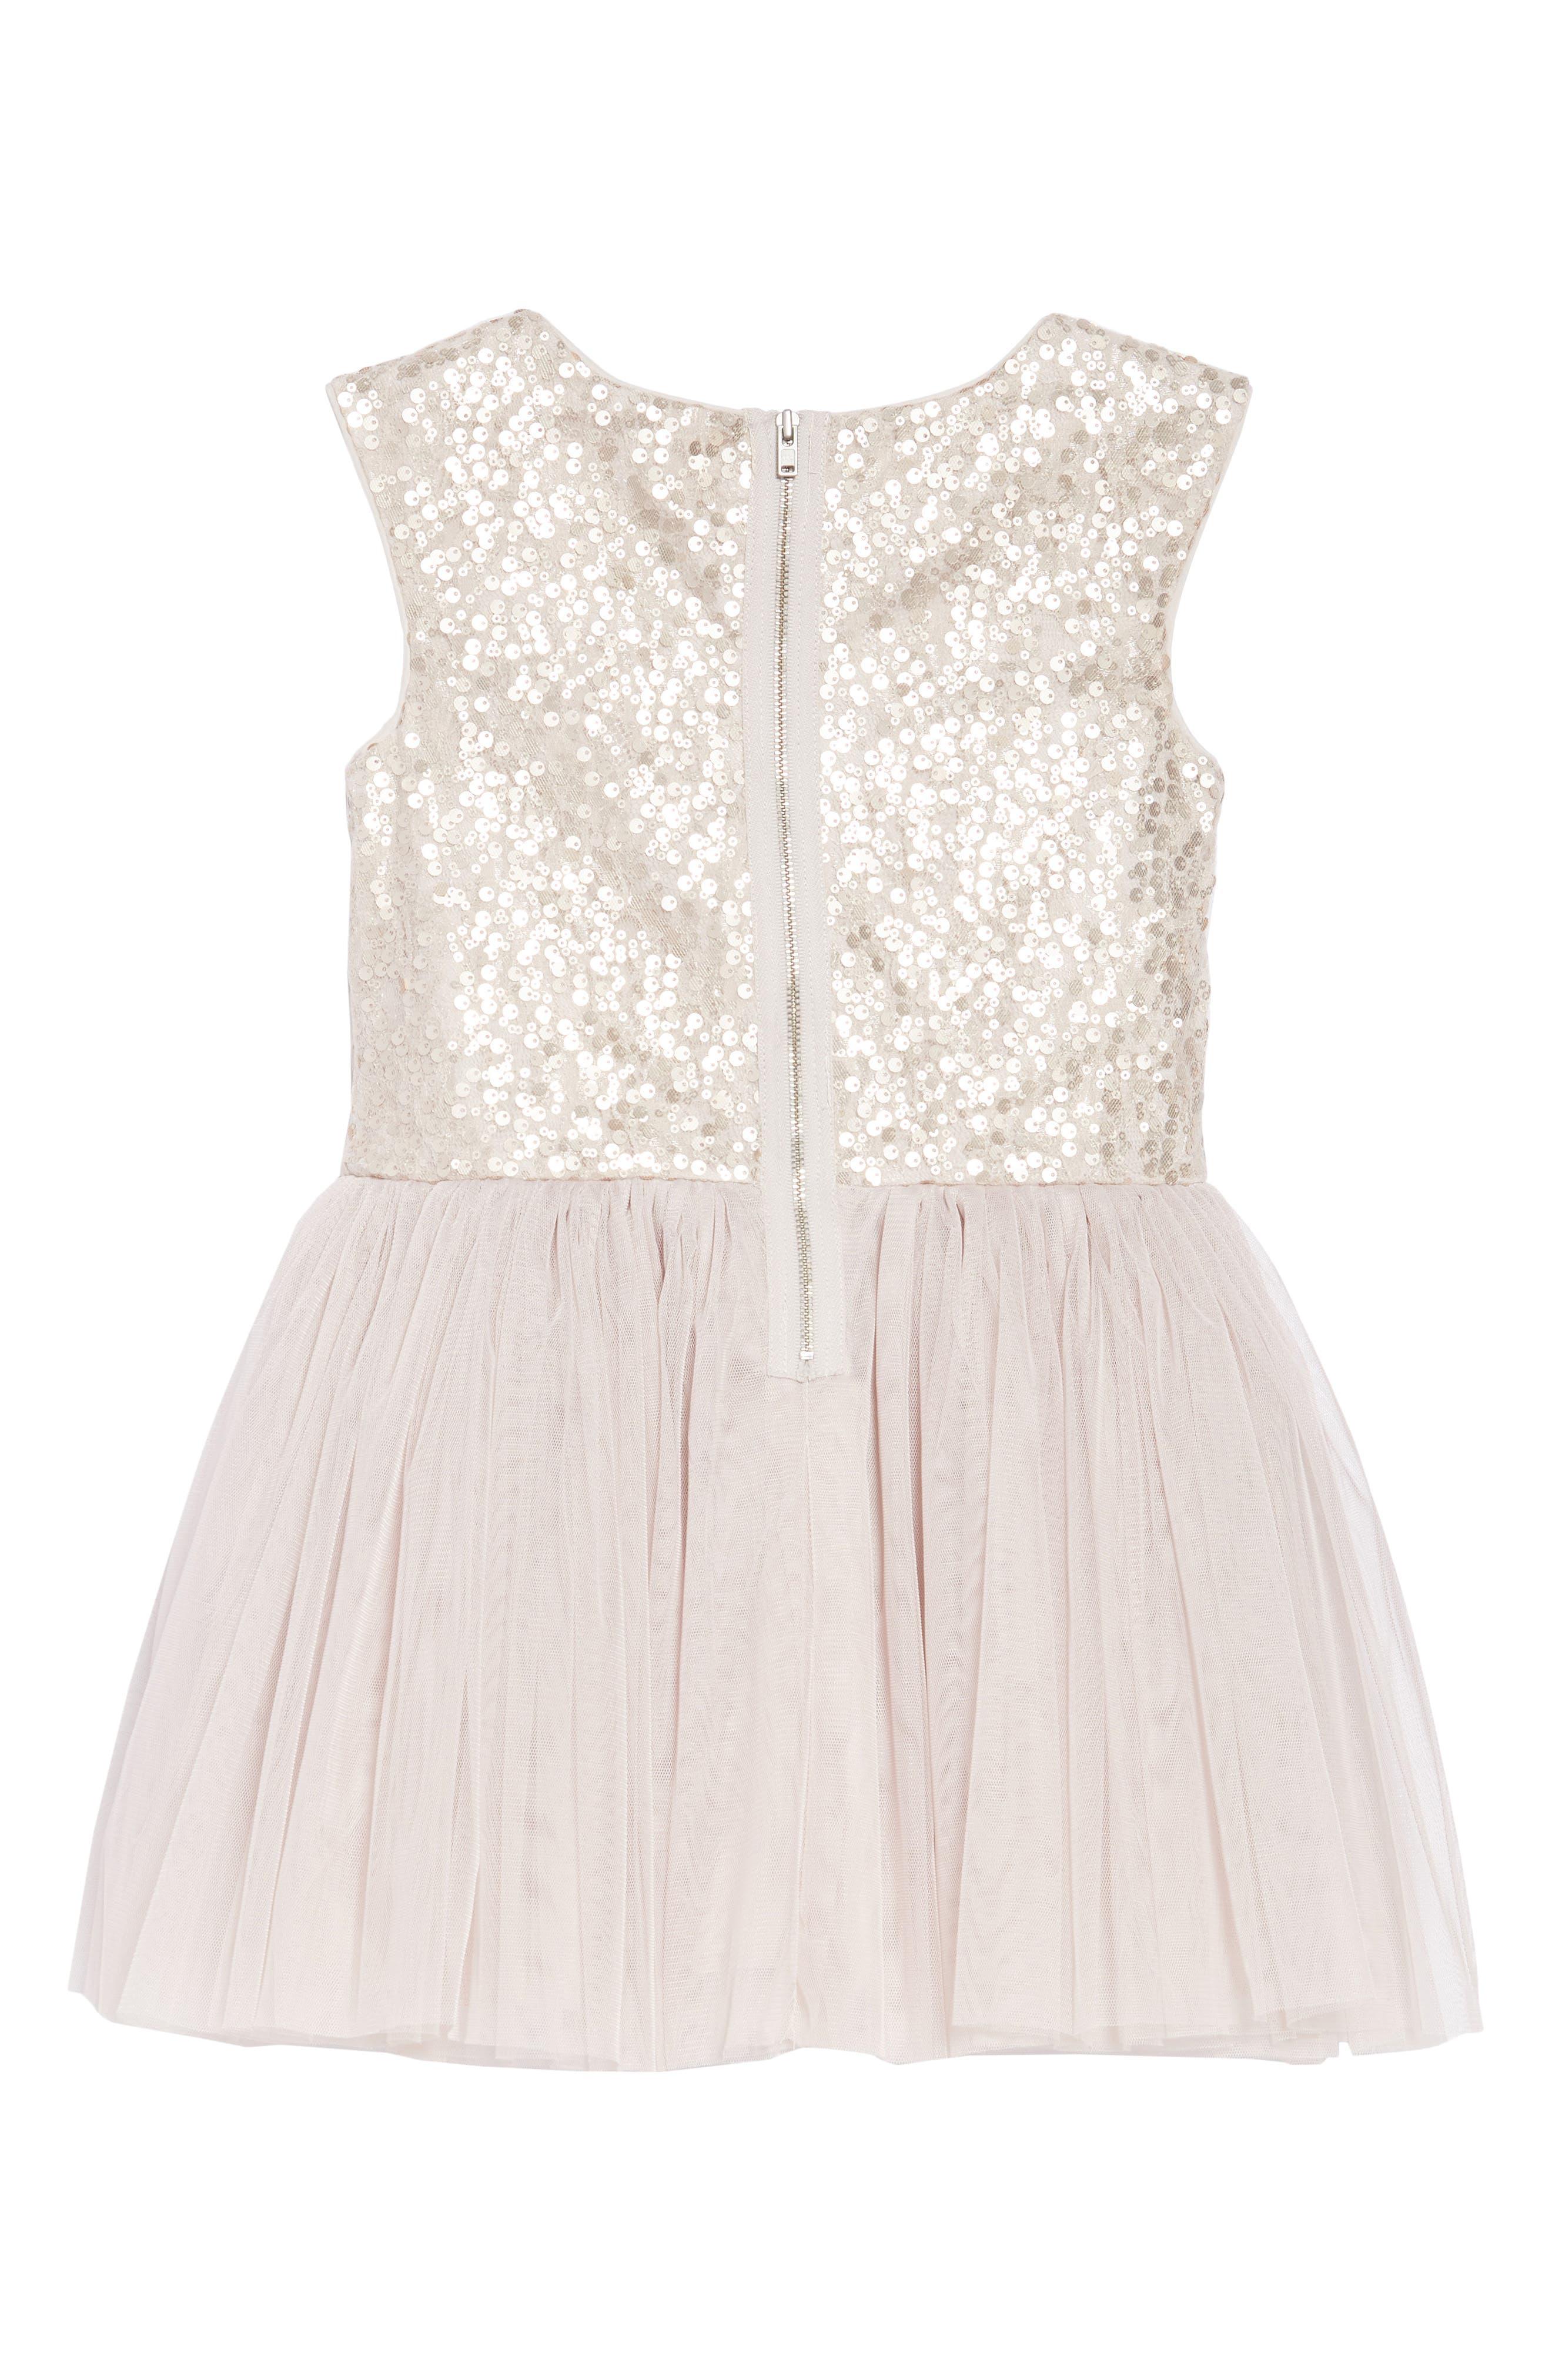 Sequin & Tulle Dress,                             Alternate thumbnail 2, color,                             650